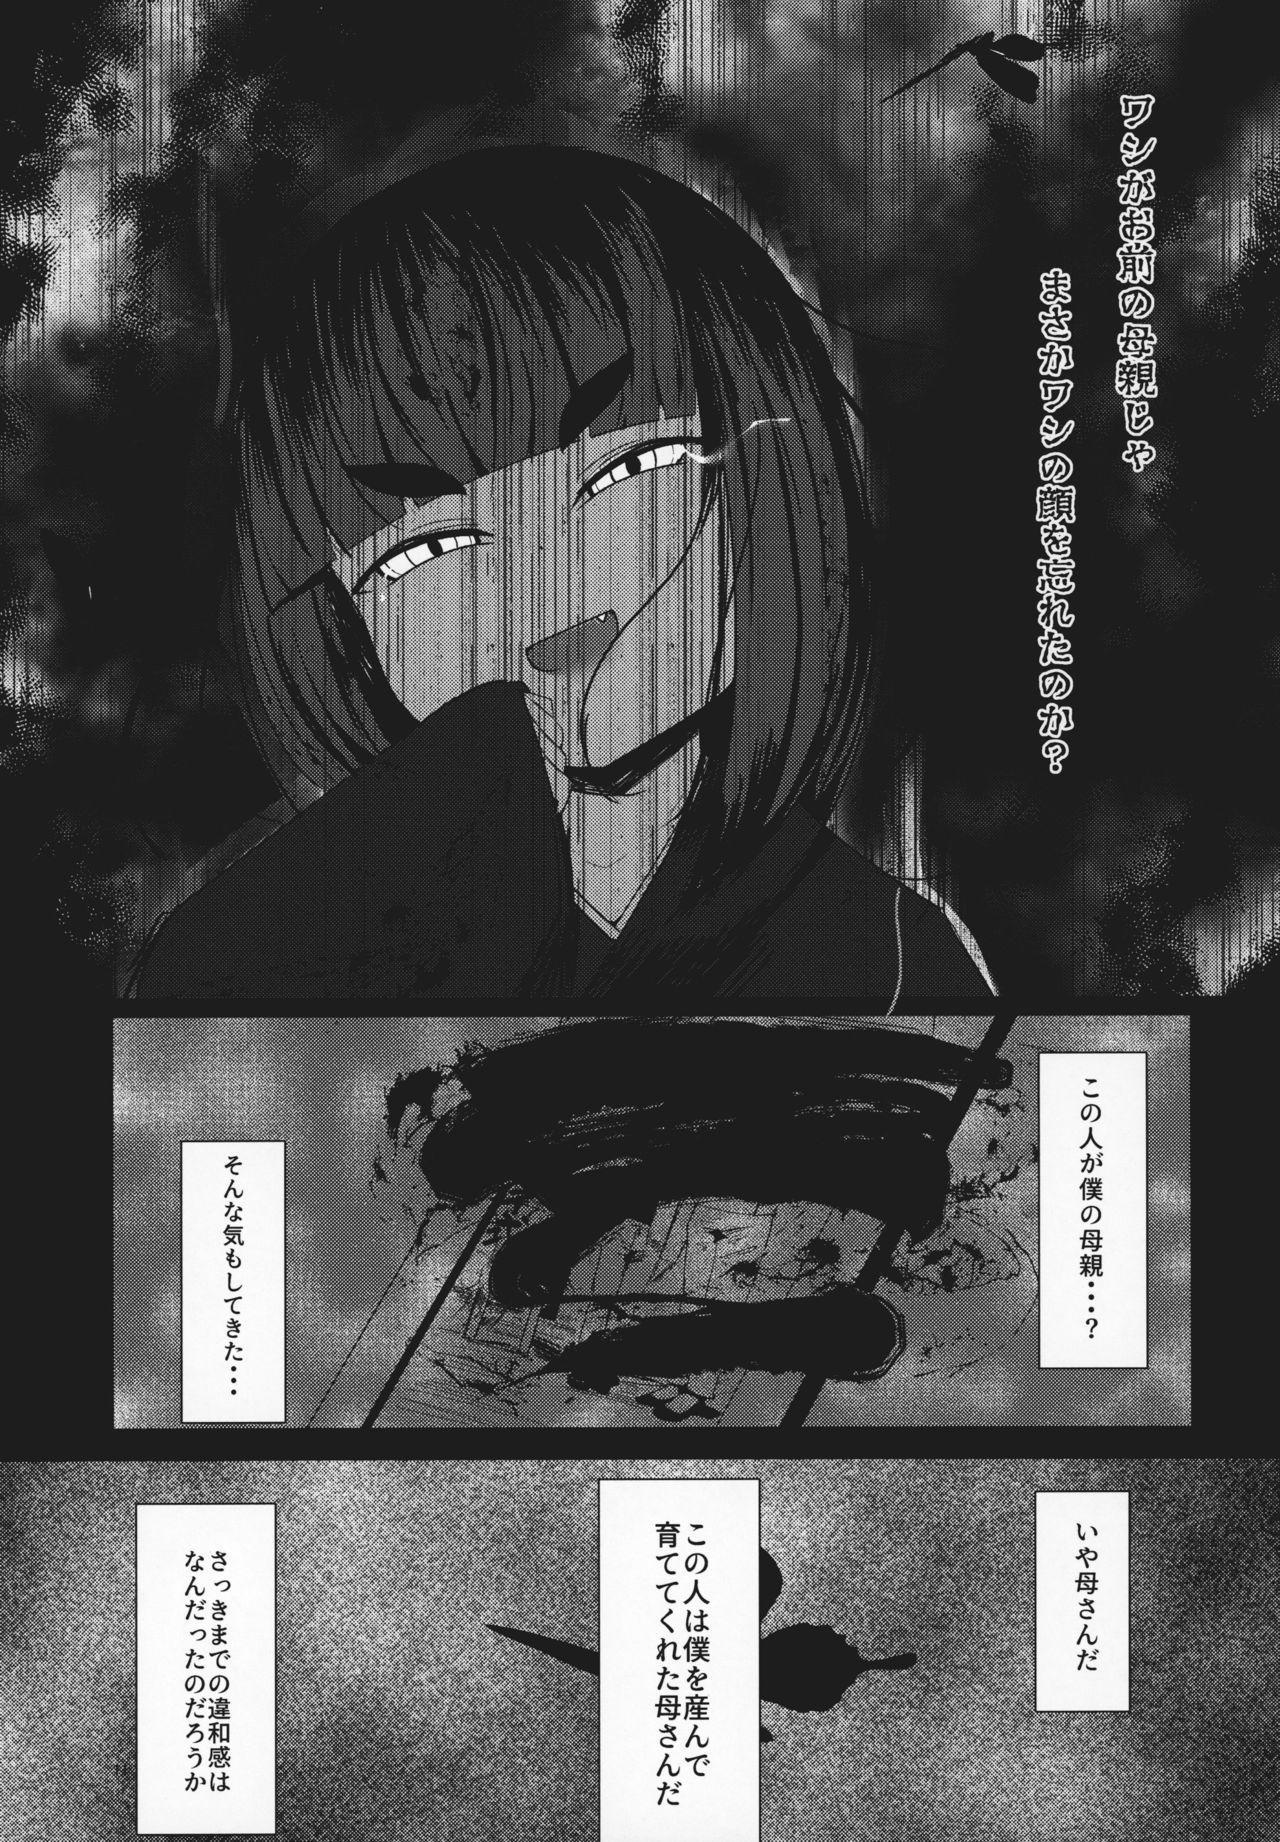 (COMITIA127) [Manpuchi (Nekodel)] Uro -Makuai- Kanwa 9